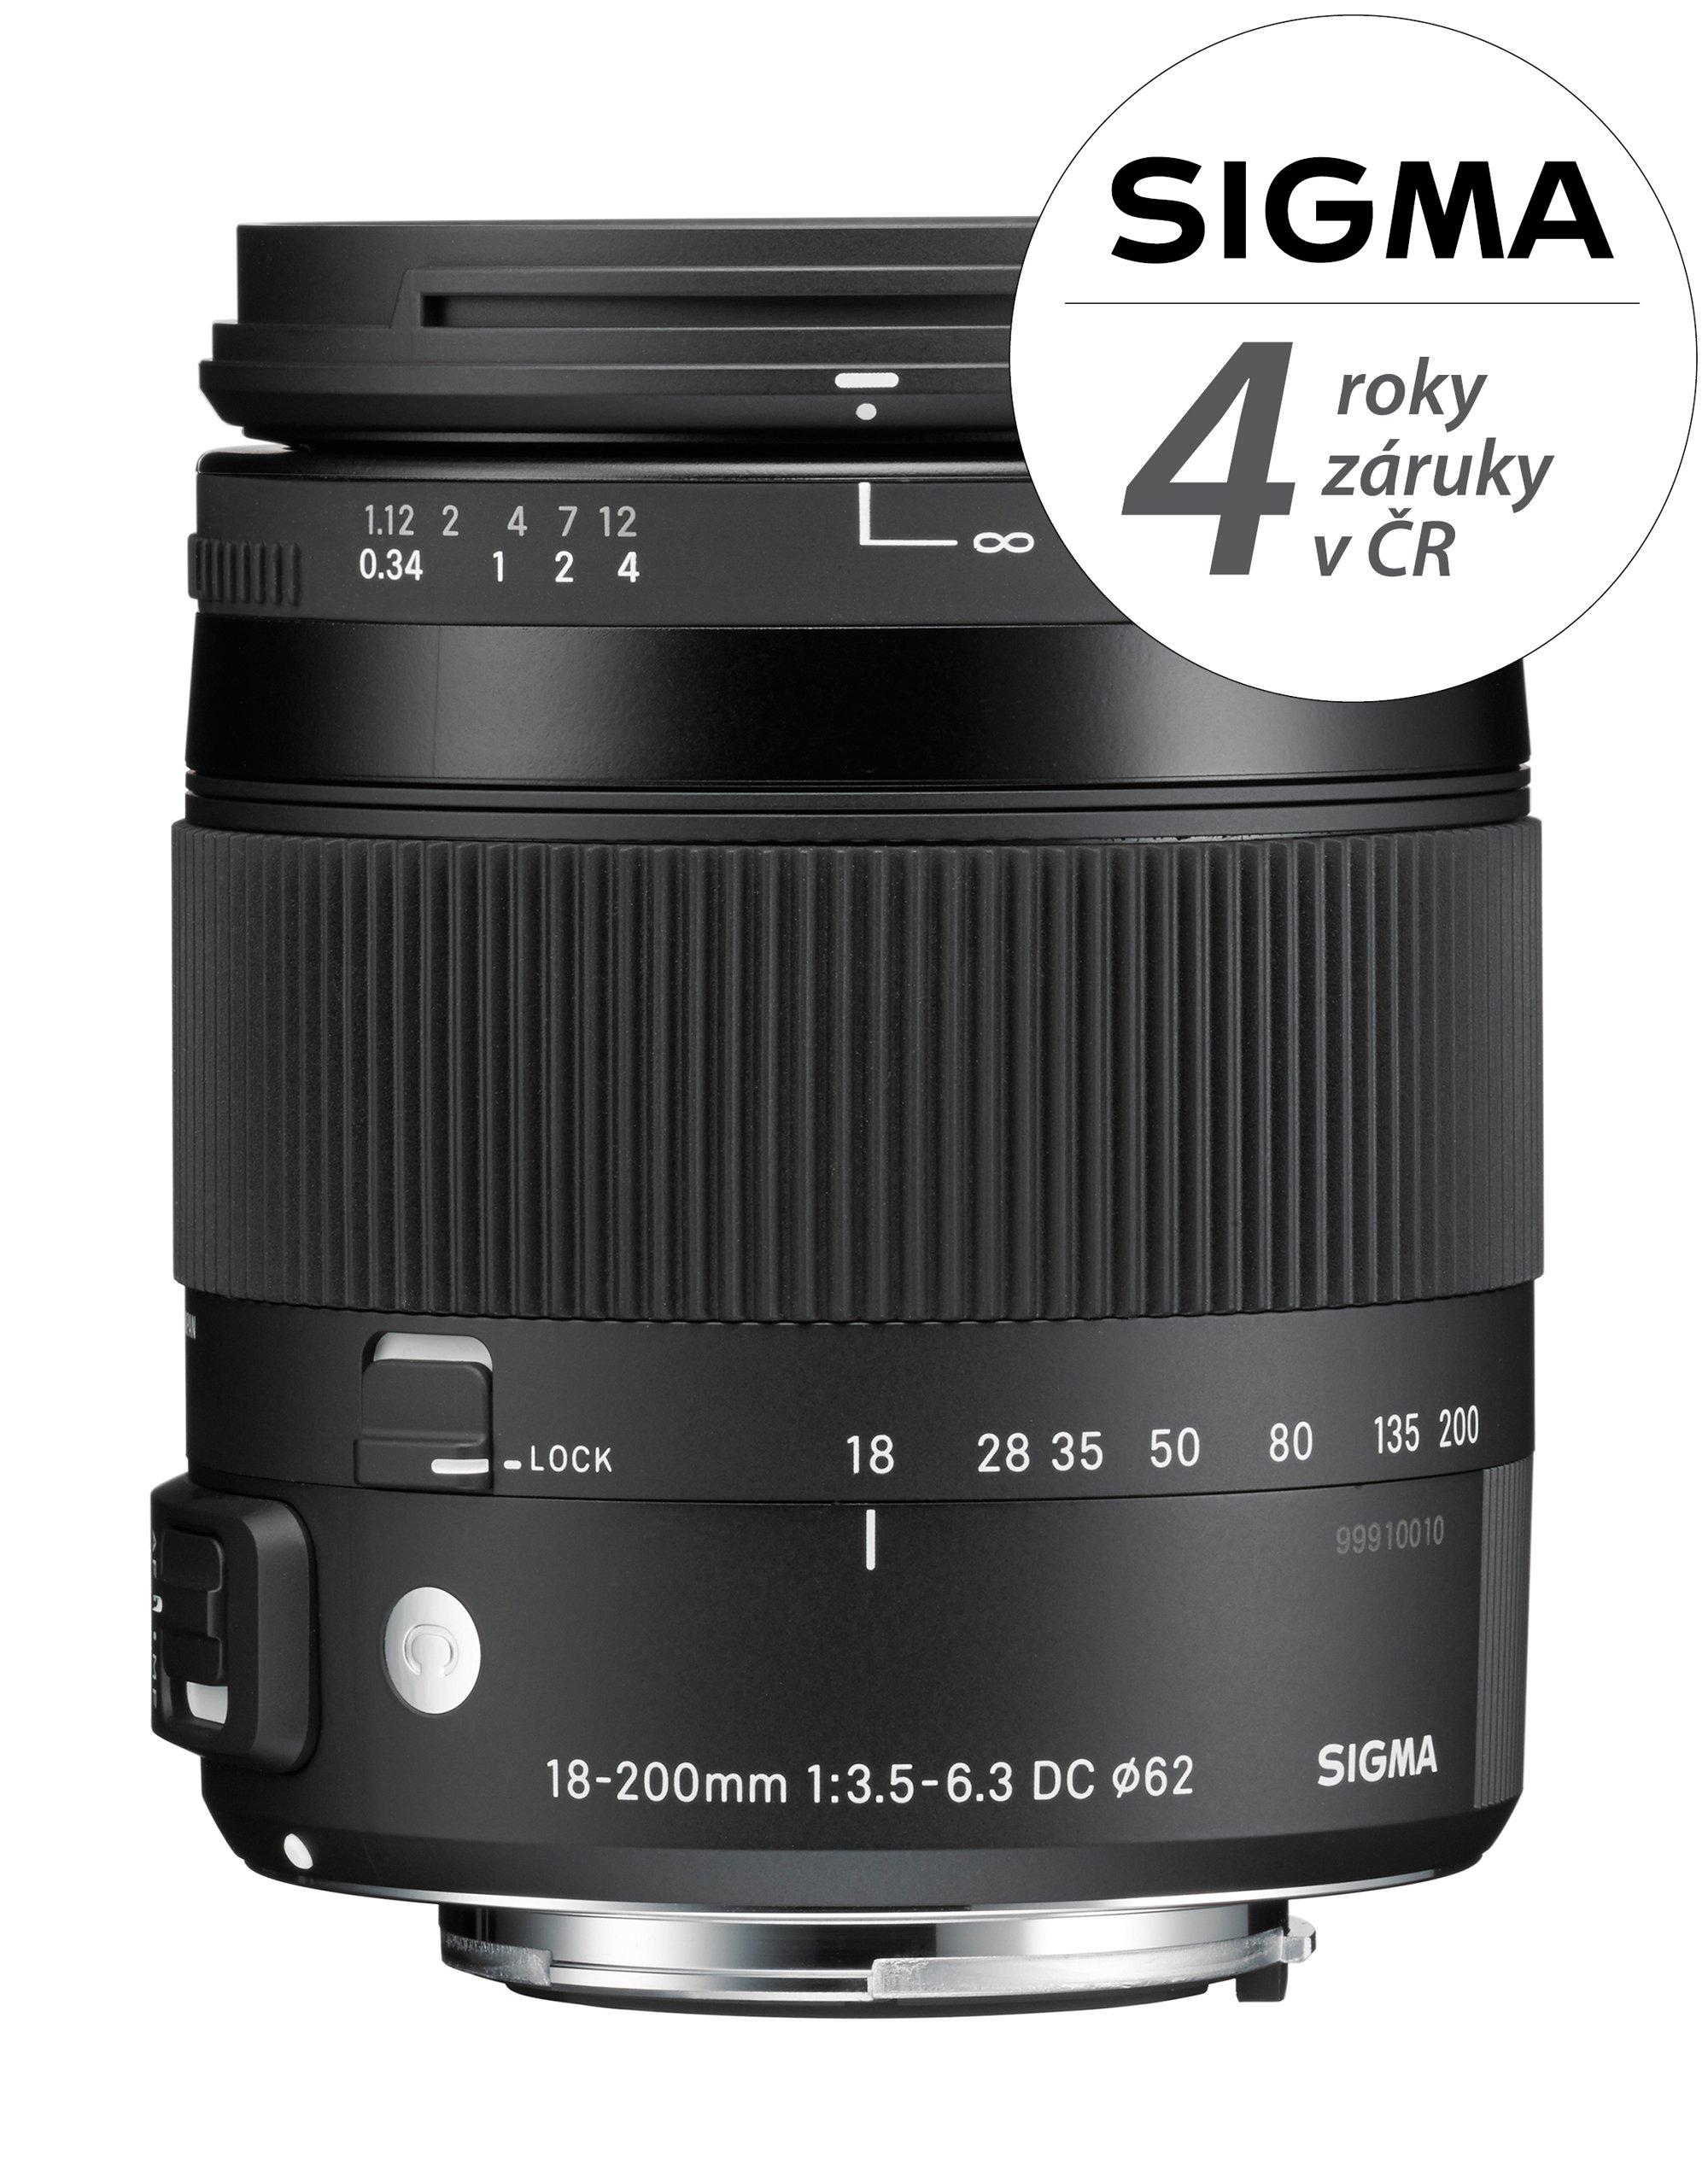 SIGMA 18-200 mm f/3,5-6,3 DC OS HSM Contemporary pro Nikon F